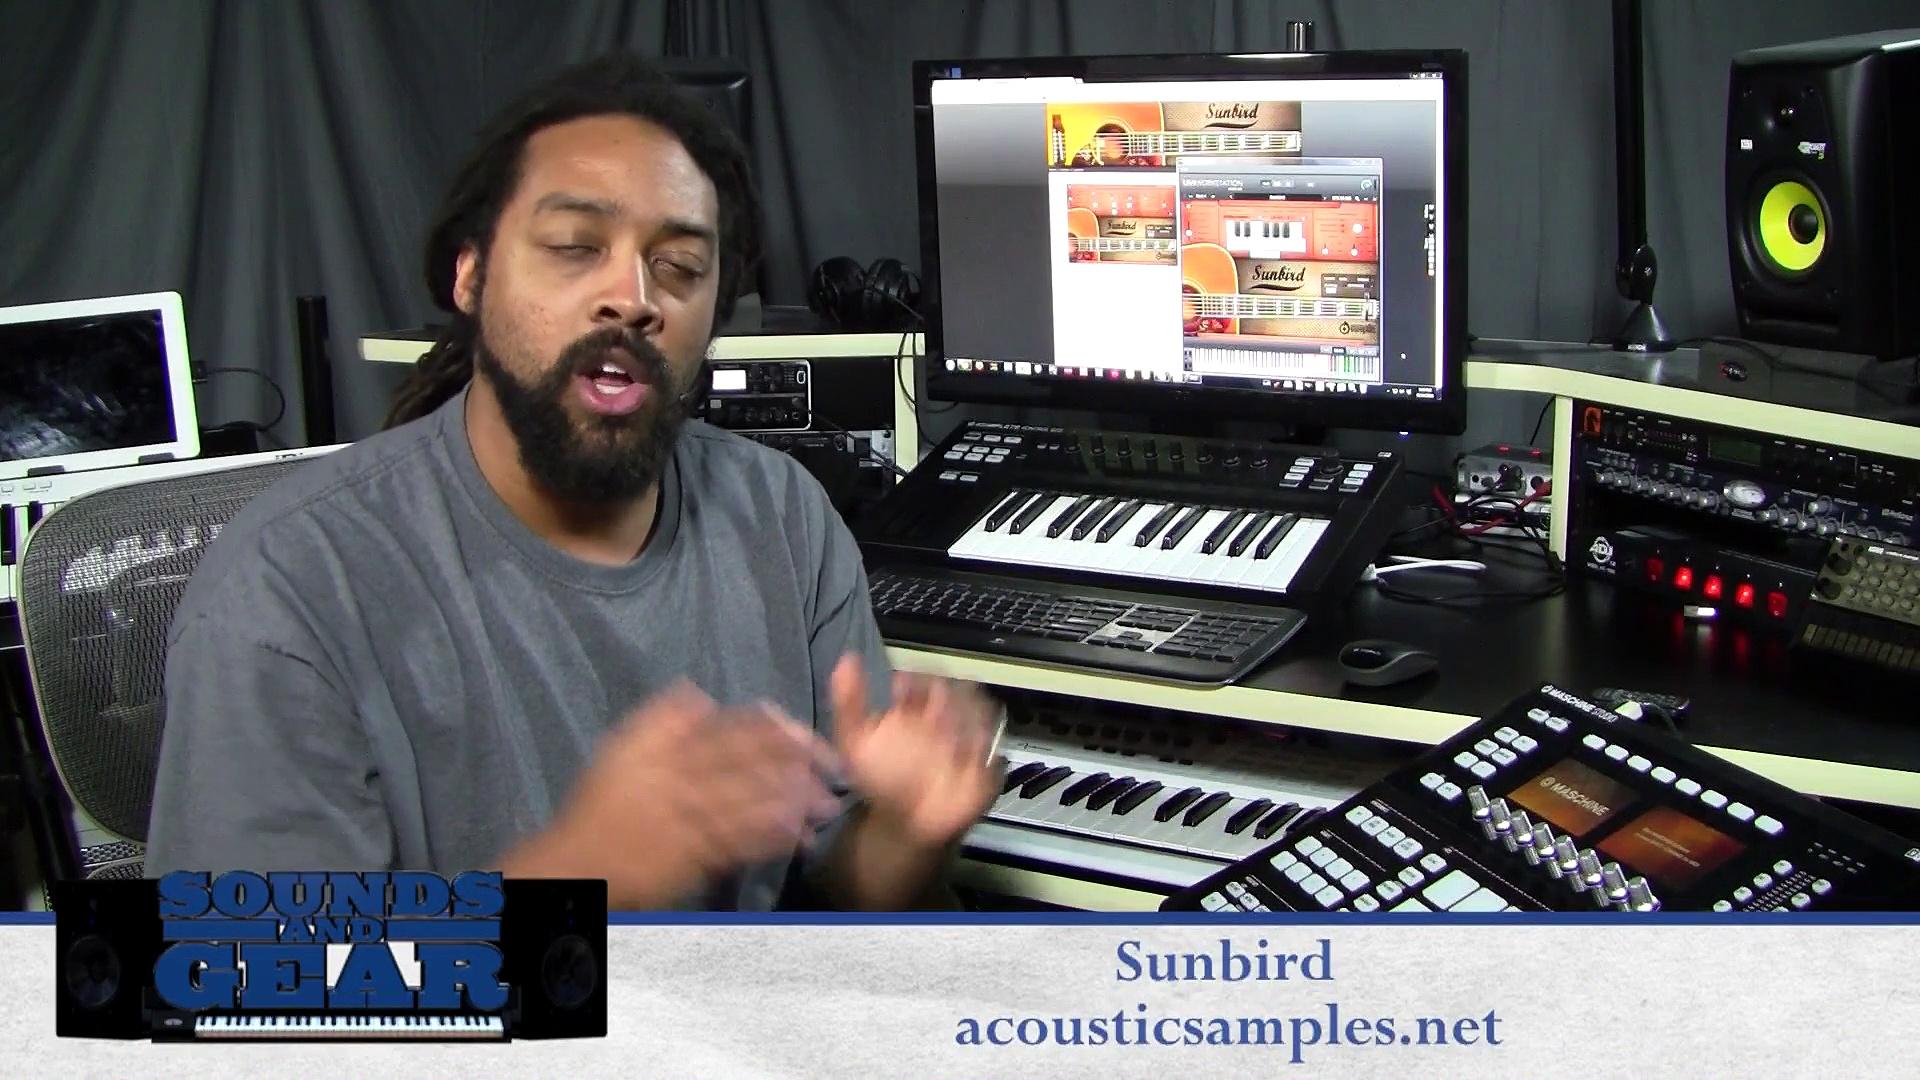 Review: Acoustic Samples Sunbird Acoustic Guitar